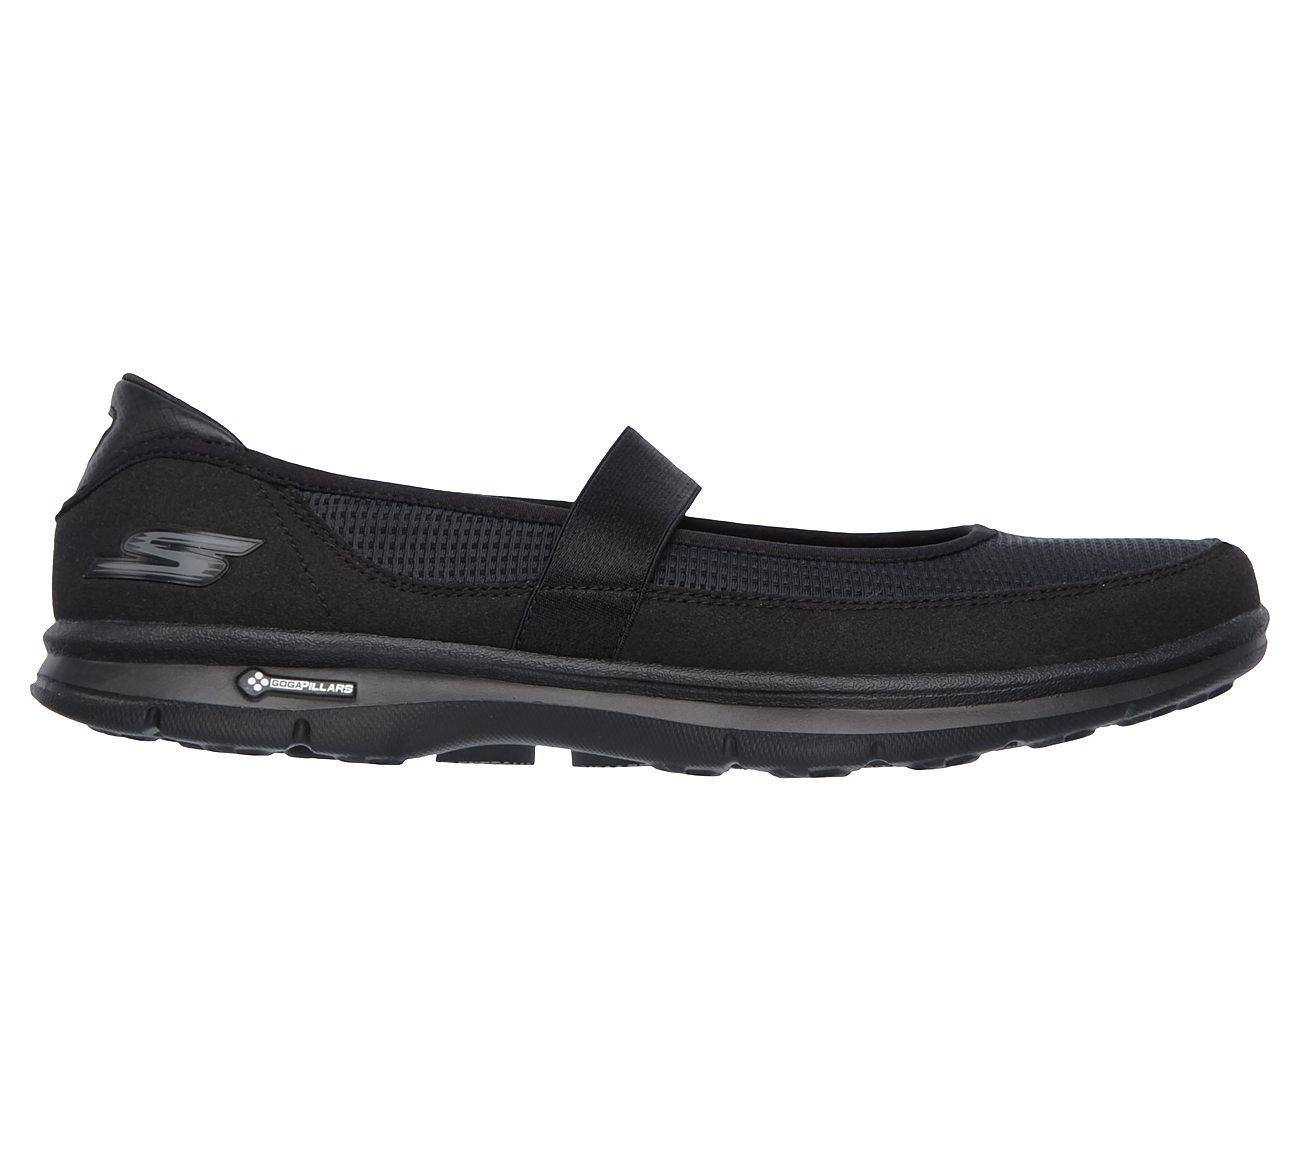 68d7855aa2 Buy SKECHERS Skechers GO STEP - Original Comfort Shoes Shoes only $69.00